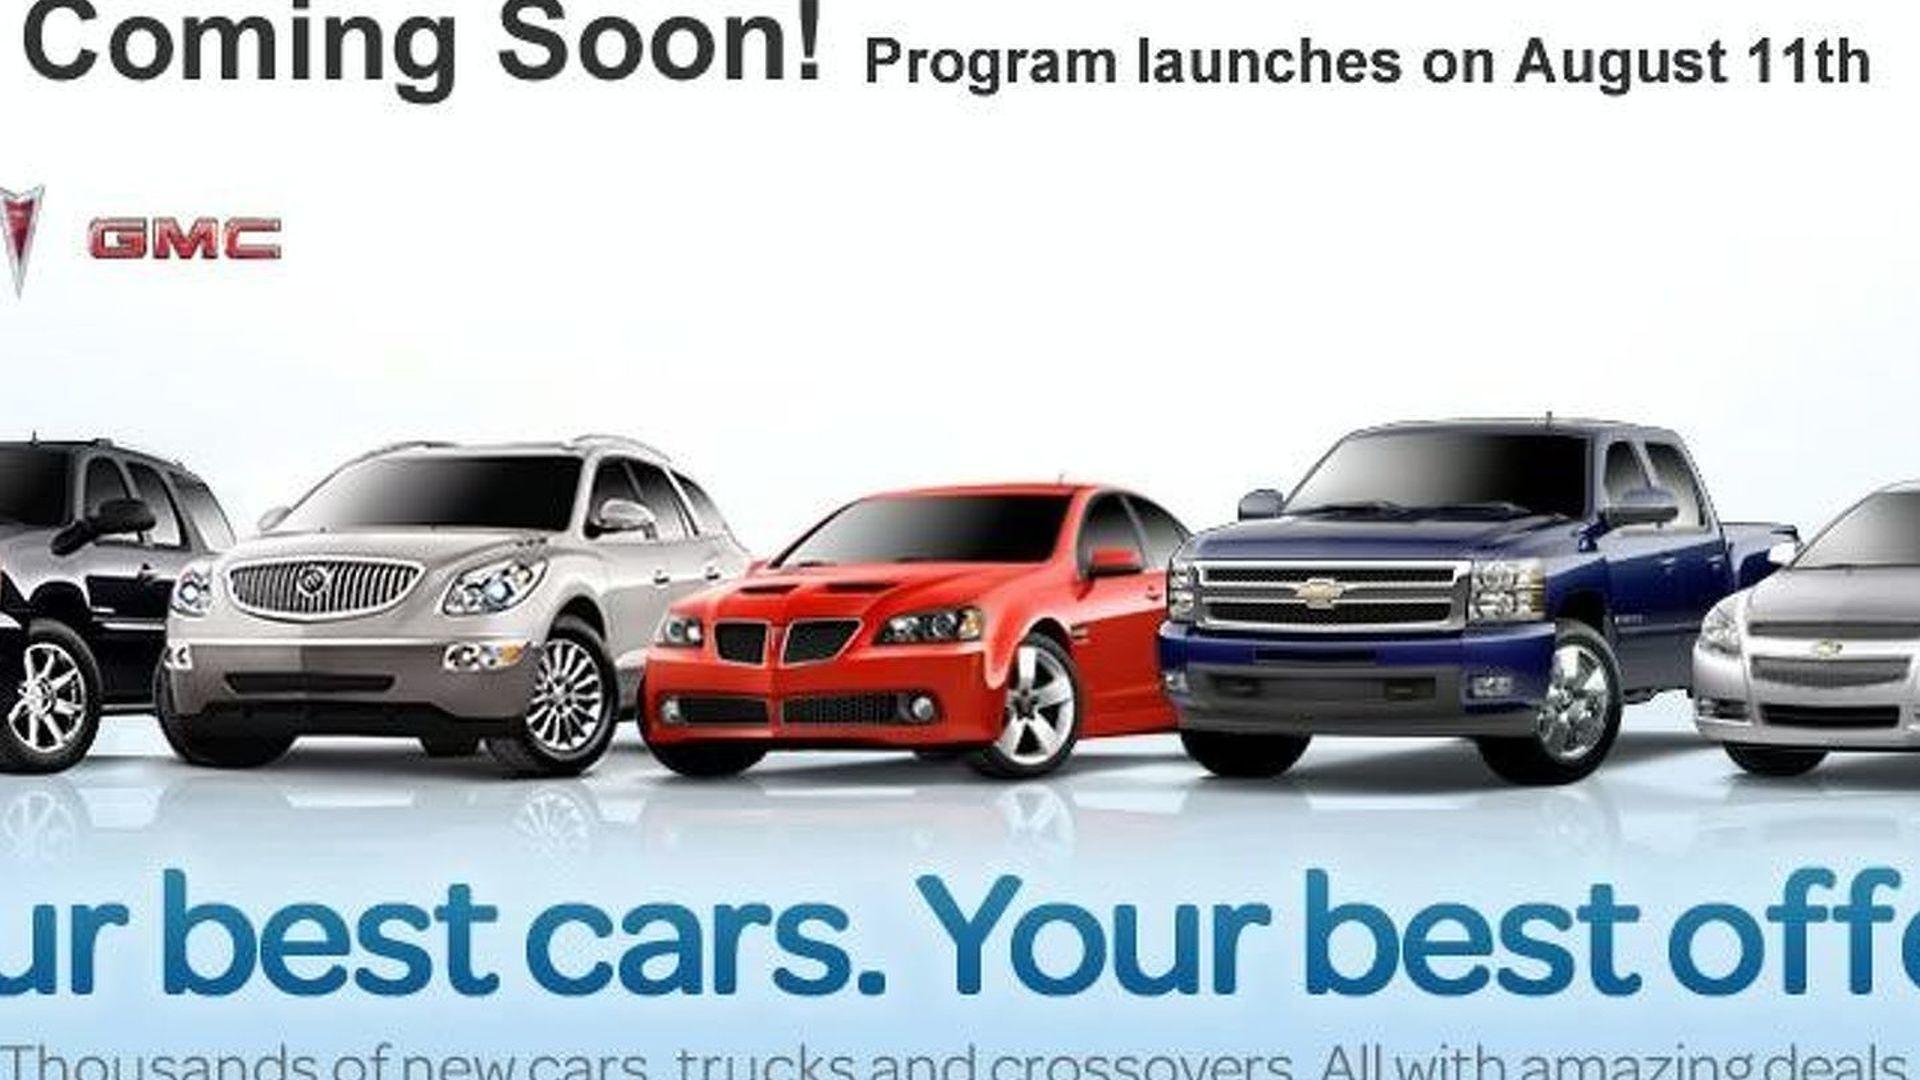 Best Ebay Motors.com Cars And Trucks Photos - Classic Cars Ideas ...